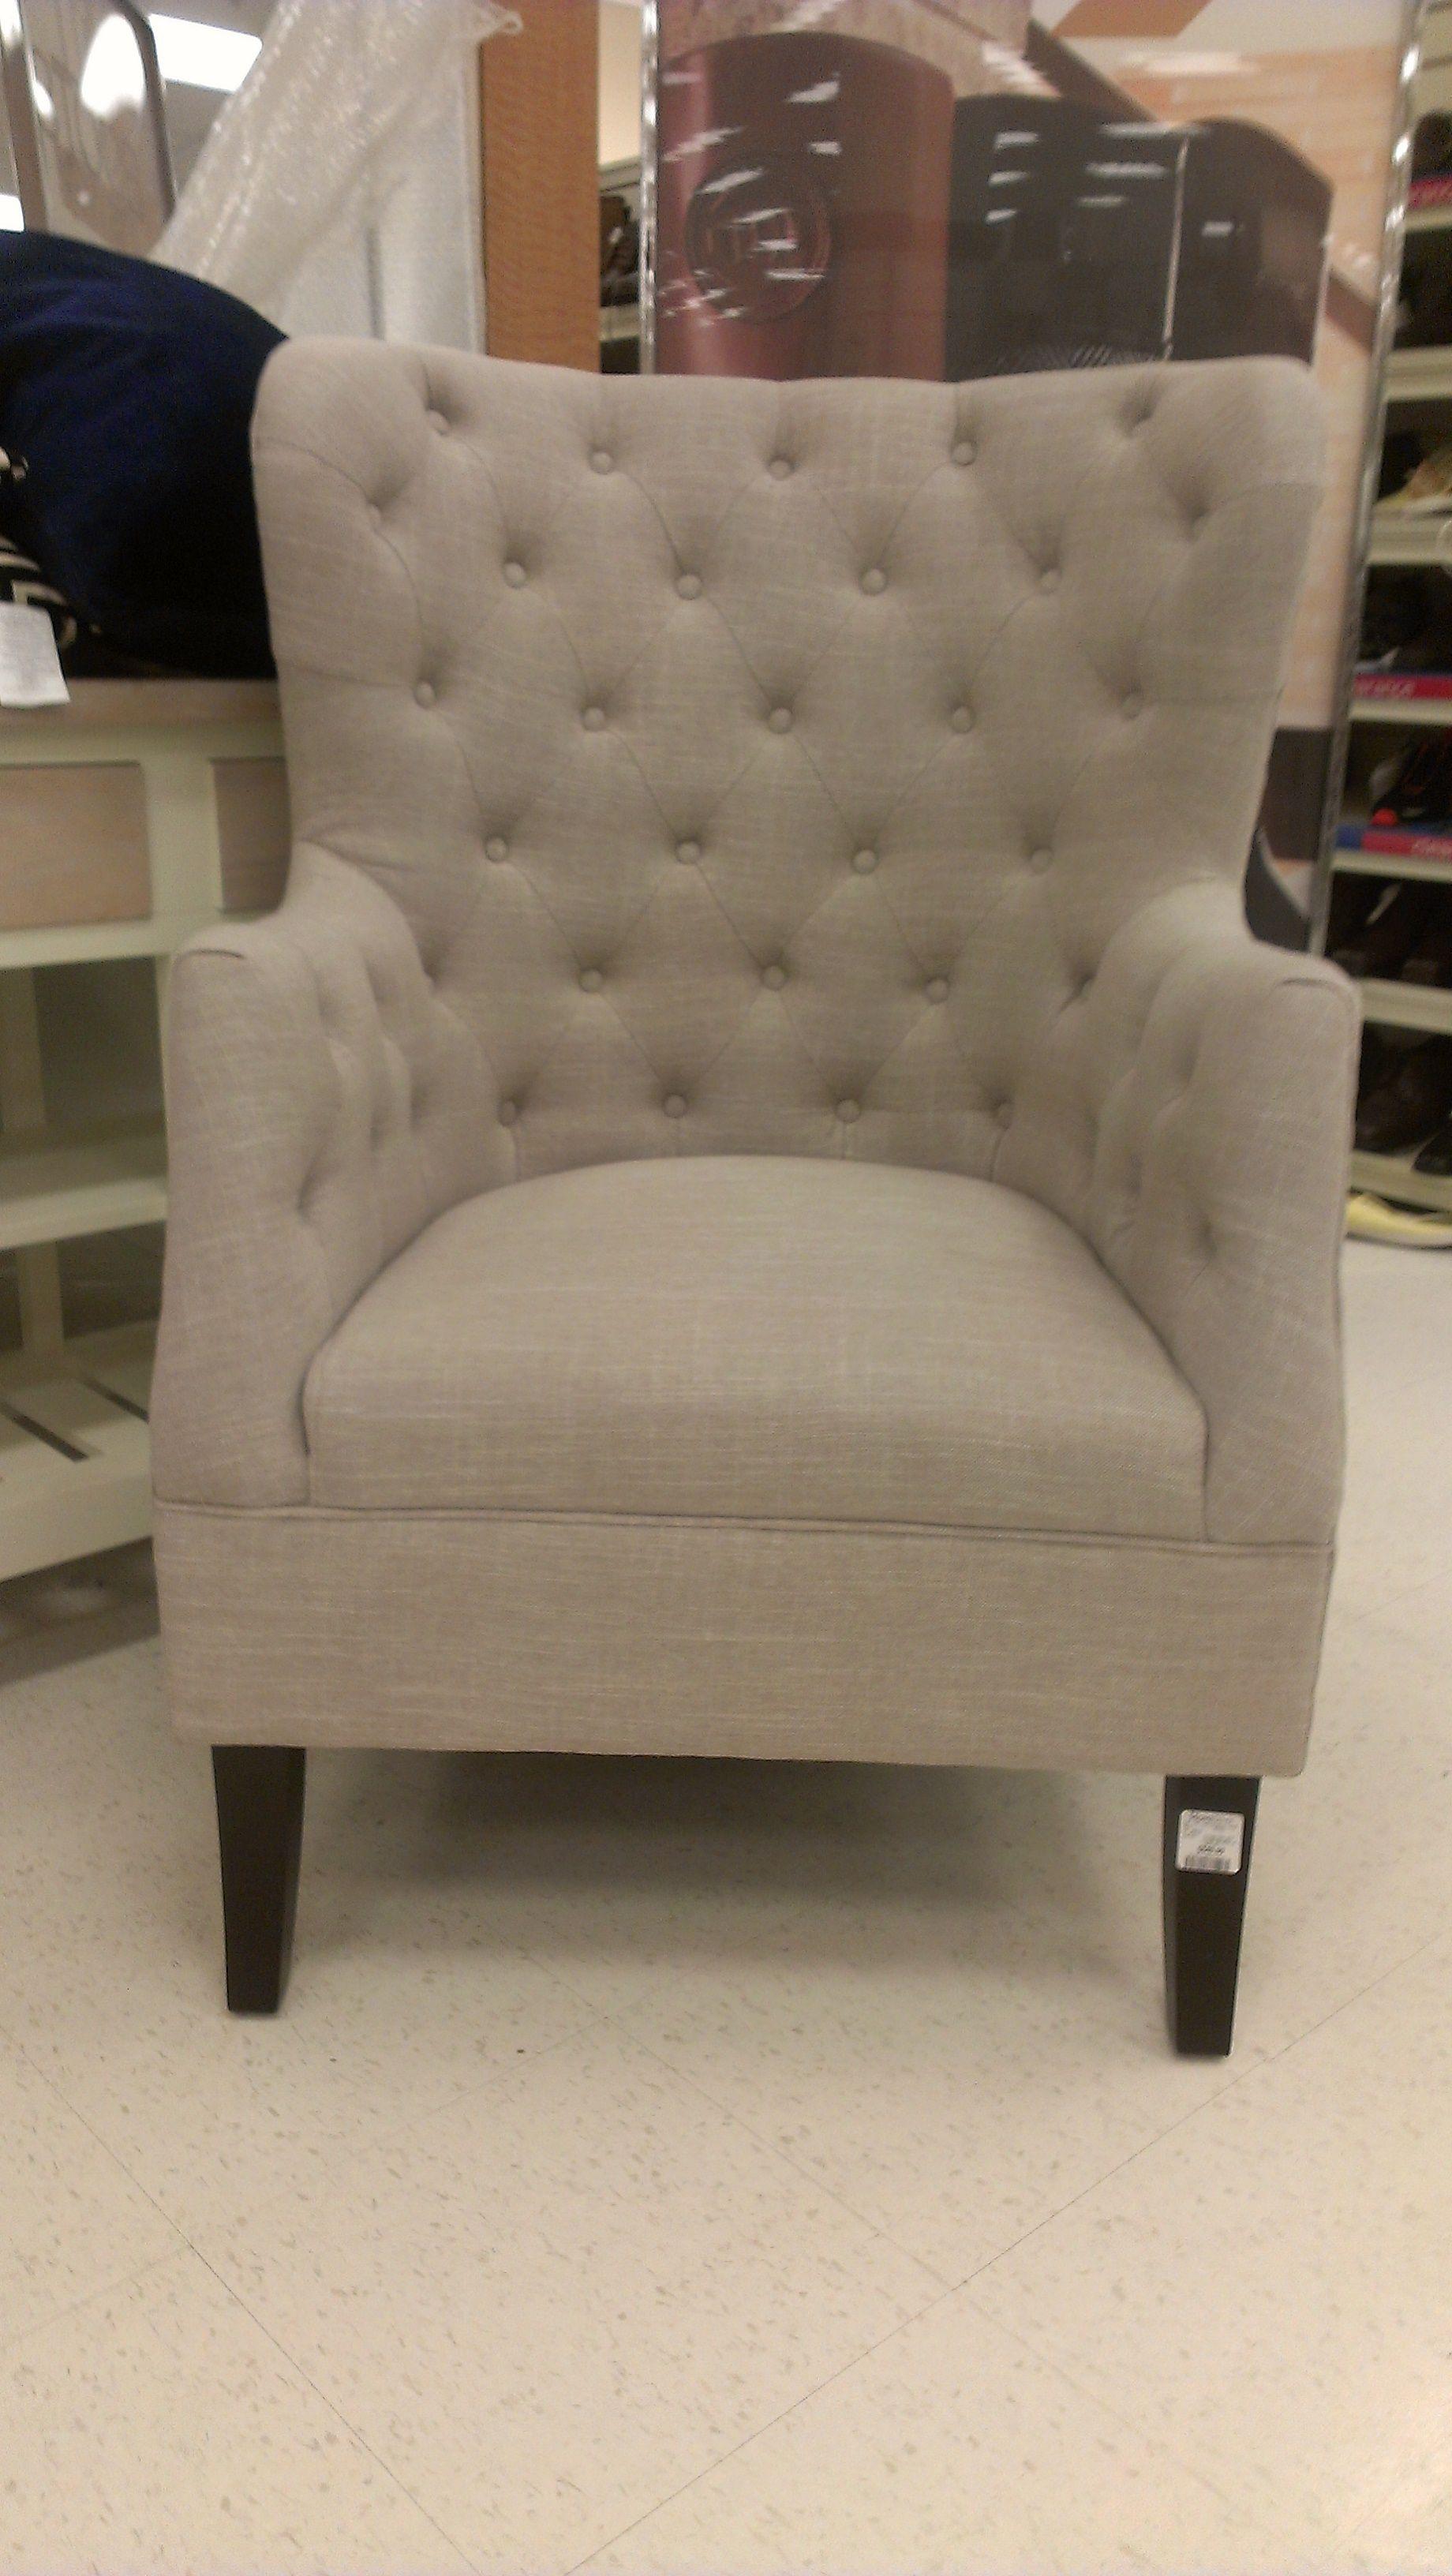 Dining Chairs At Homesense.Chair Homesense Homesensestyle In 2019 Bedroom Decor